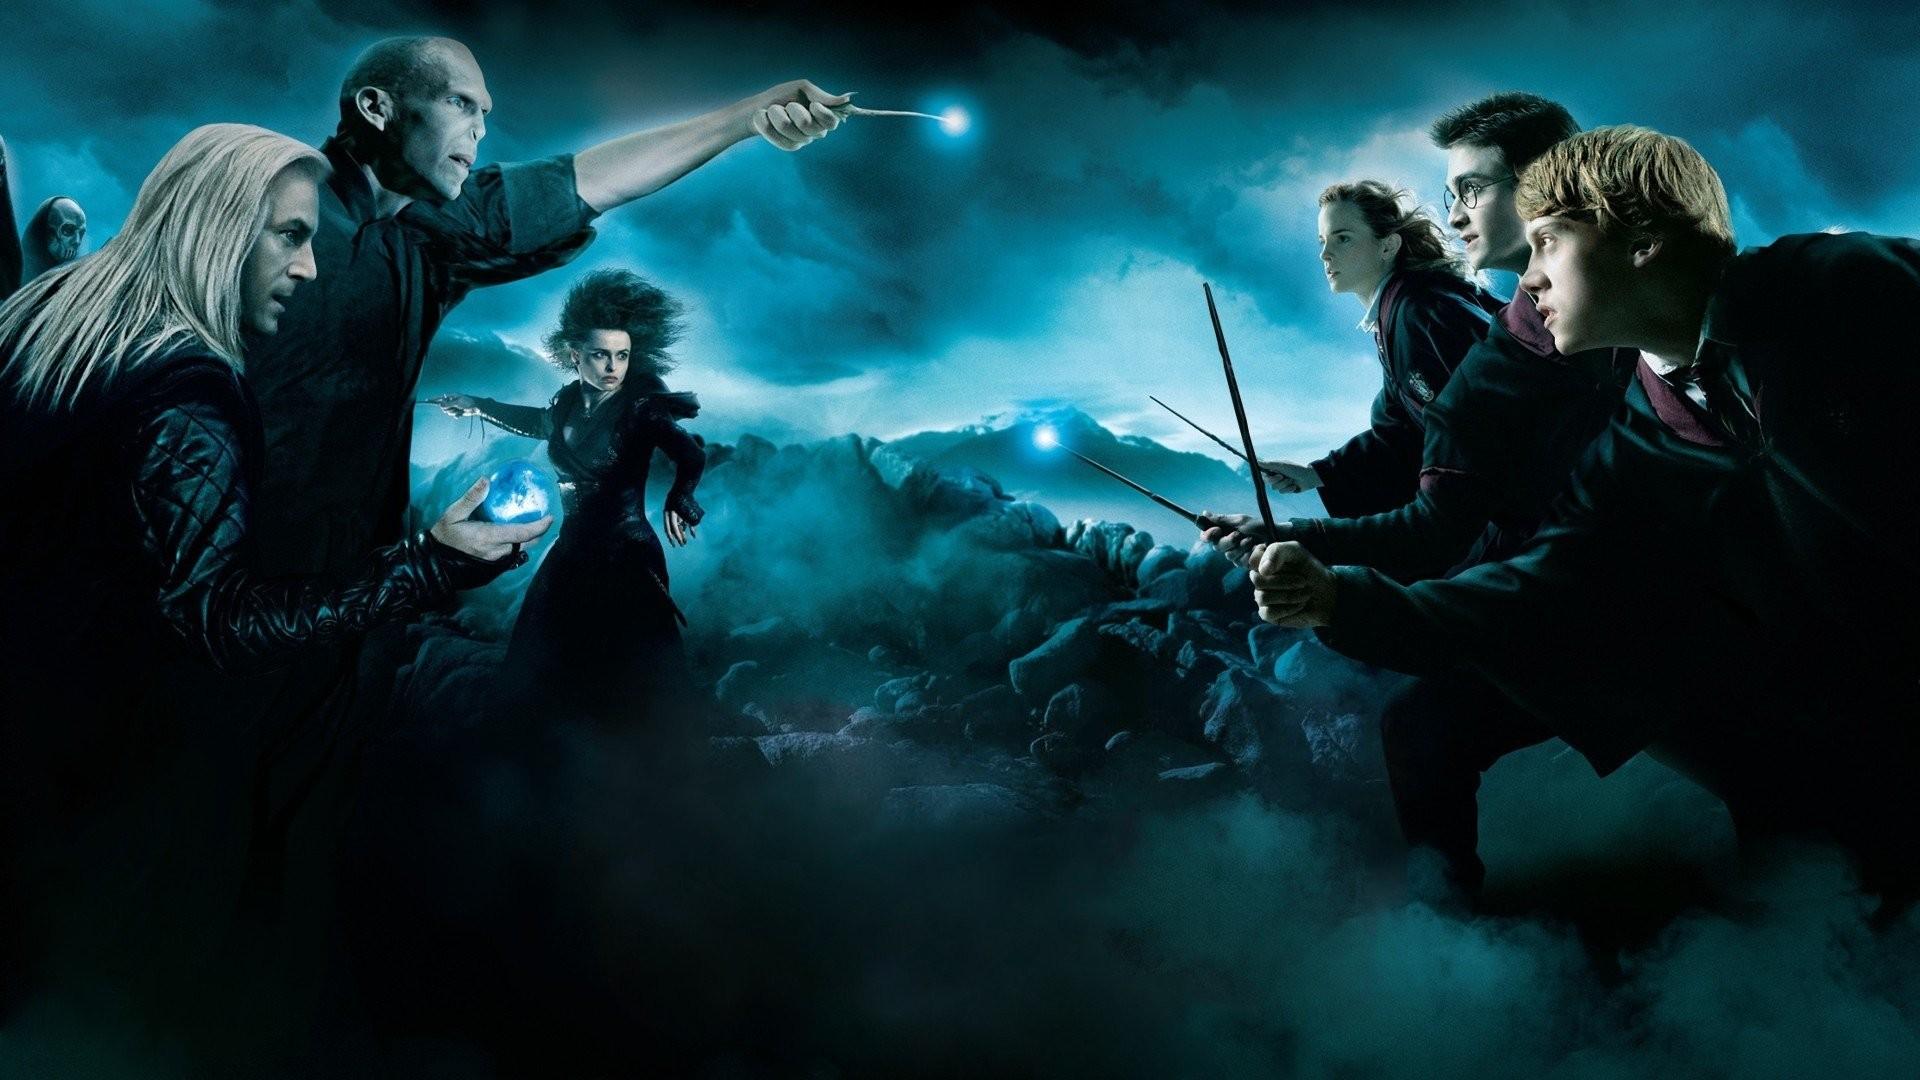 Amazing Wallpaper Harry Potter Ipad - 730160-bellatrix-lestrange-wallpaper-1920x1080-for-ipad-2  Image_246371.jpg